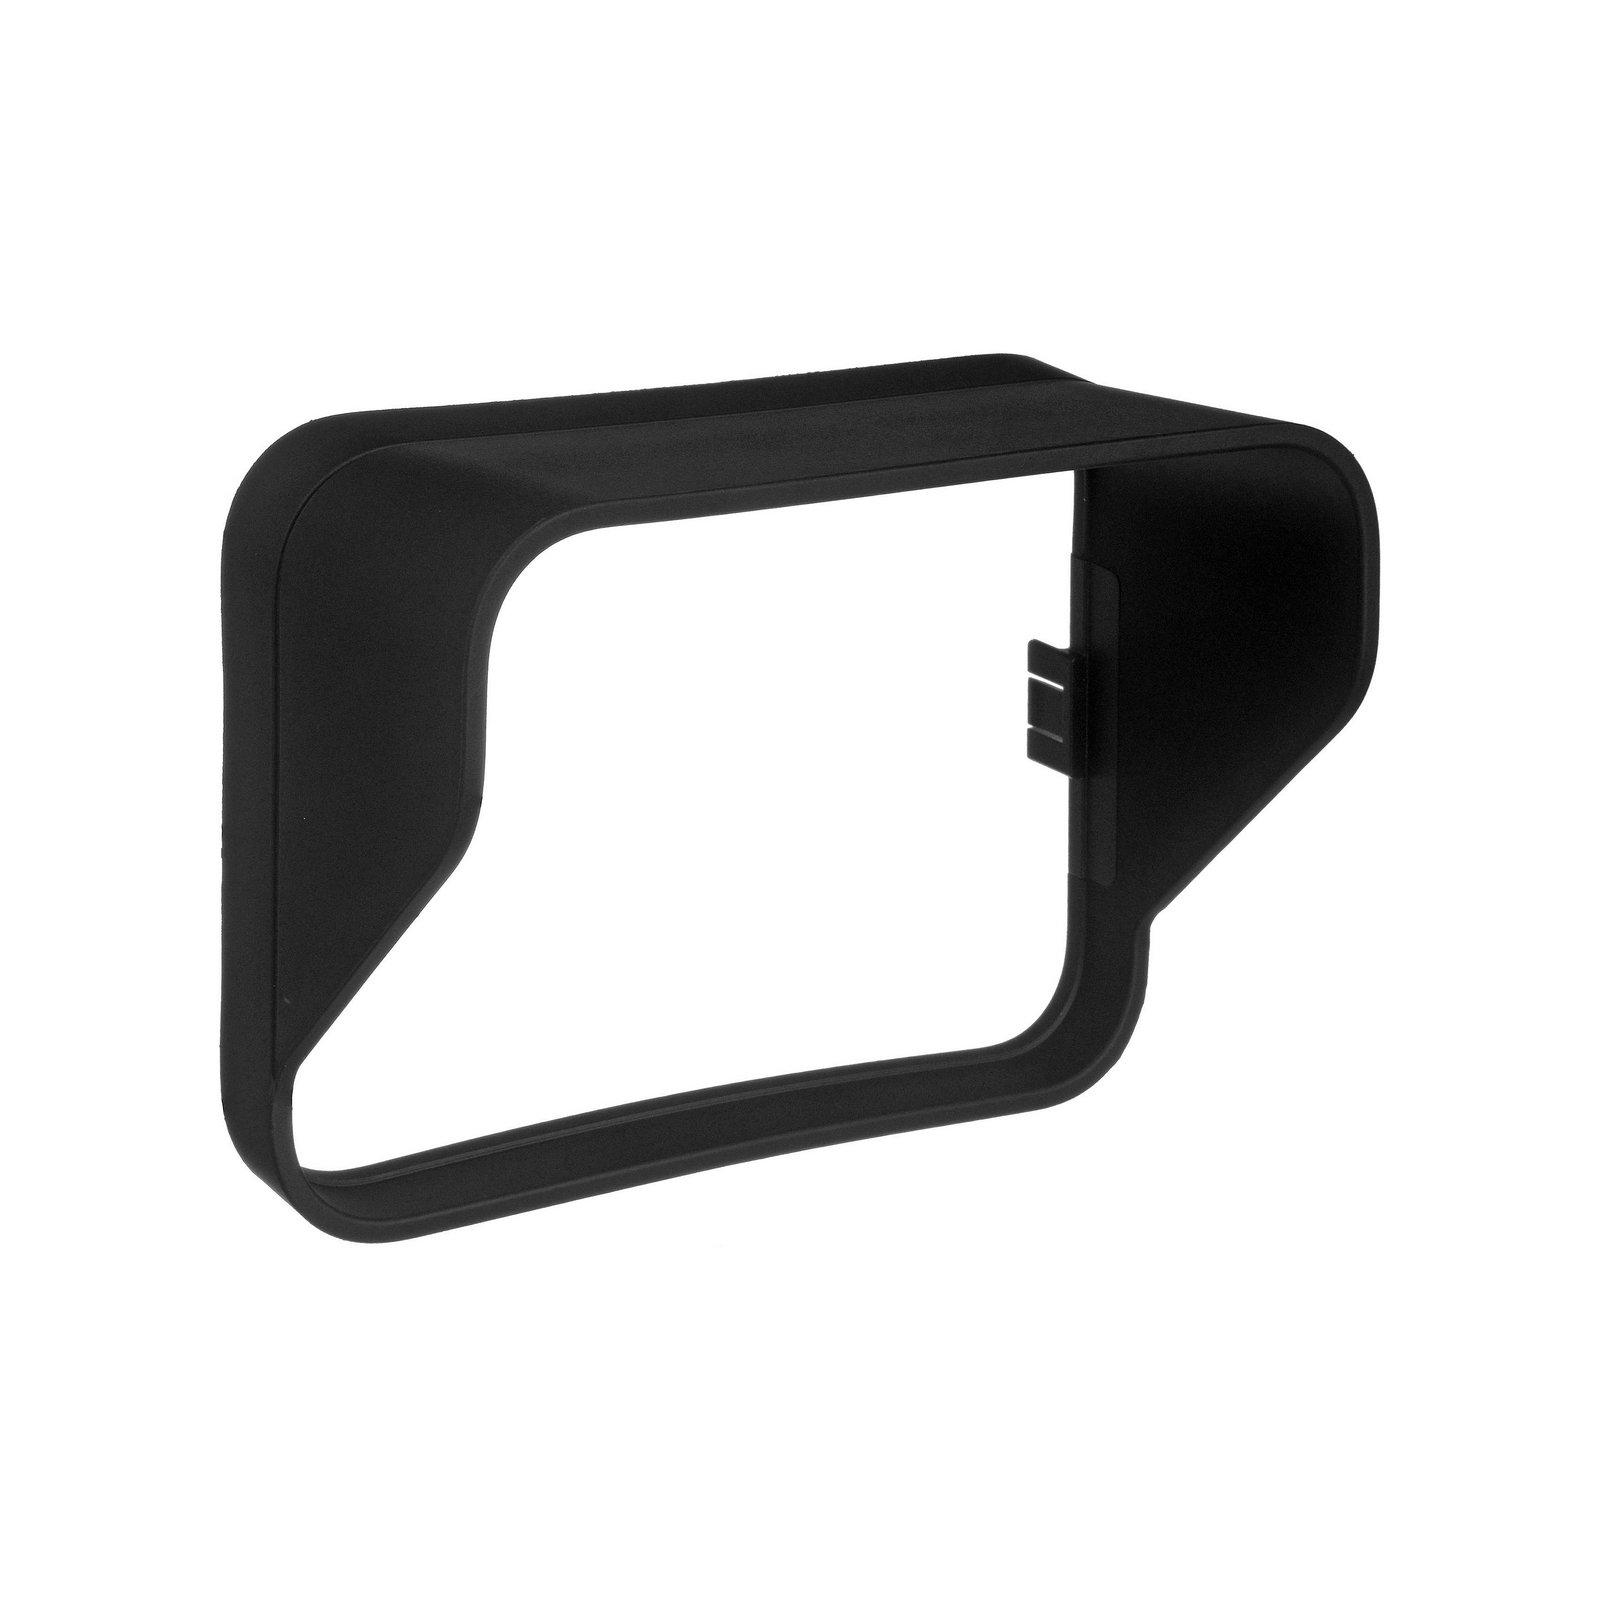 Blackmagic Design Sunshade | Accessory Cinema Camera